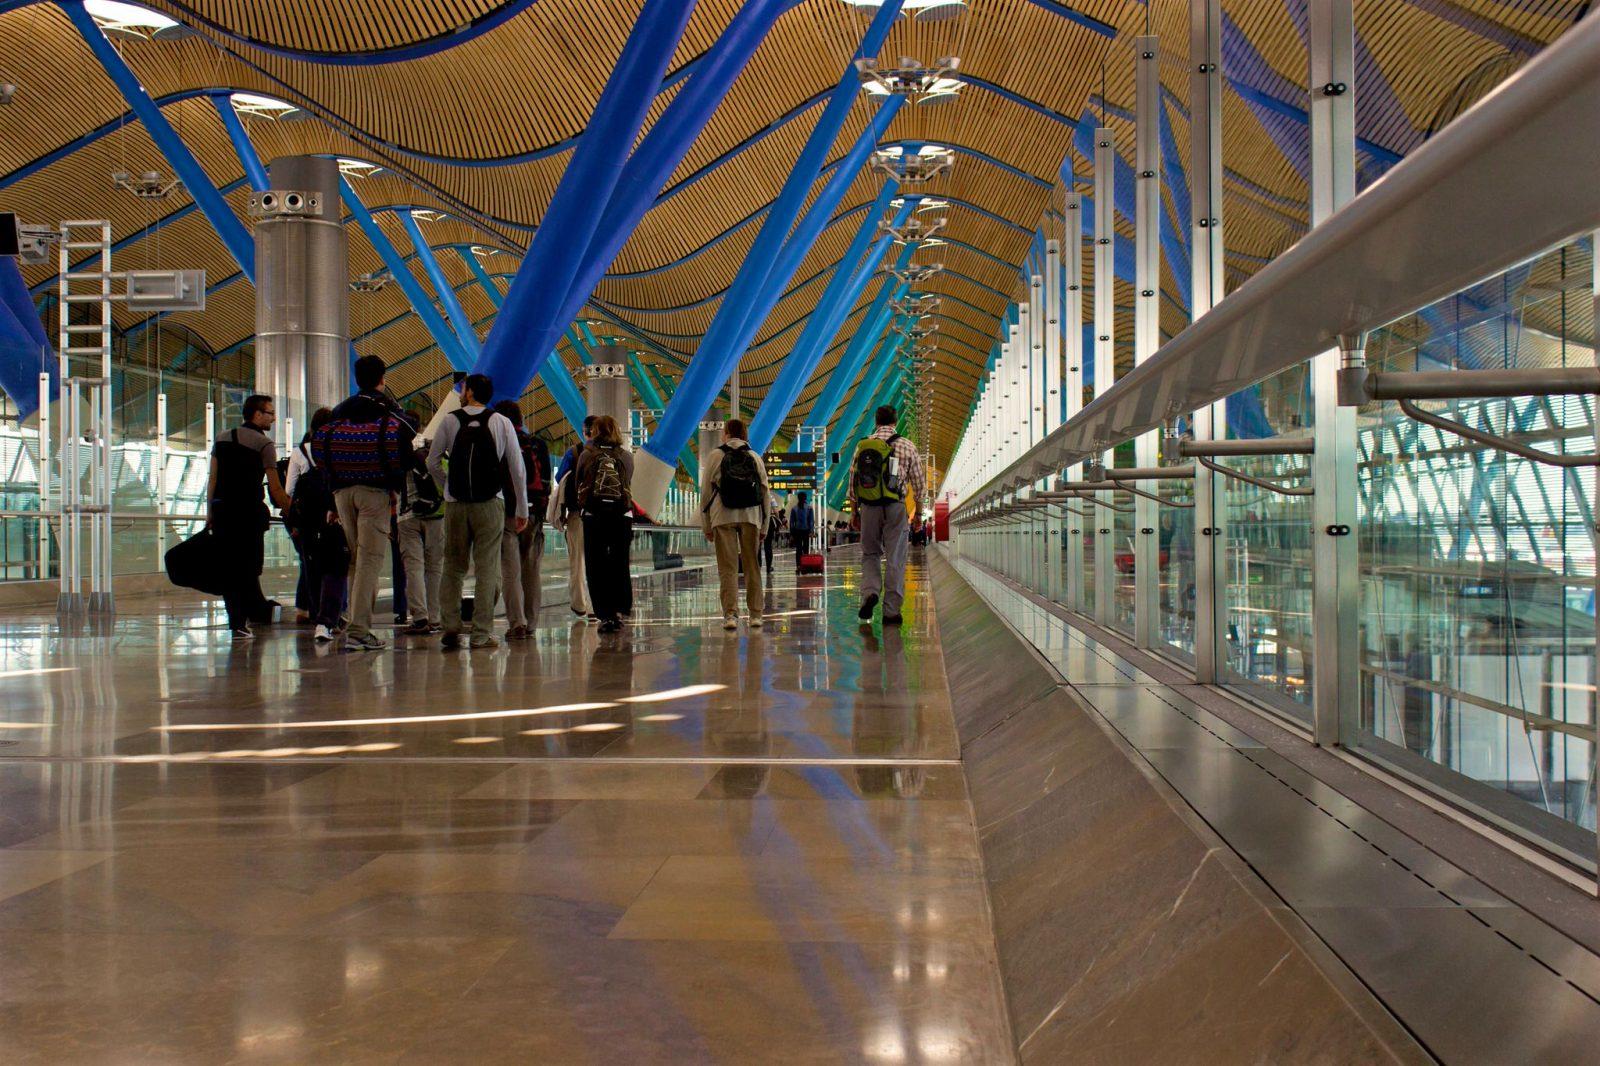 Аэропорт Madrid-Barajas, терминал T4S (фото: Andrés .)